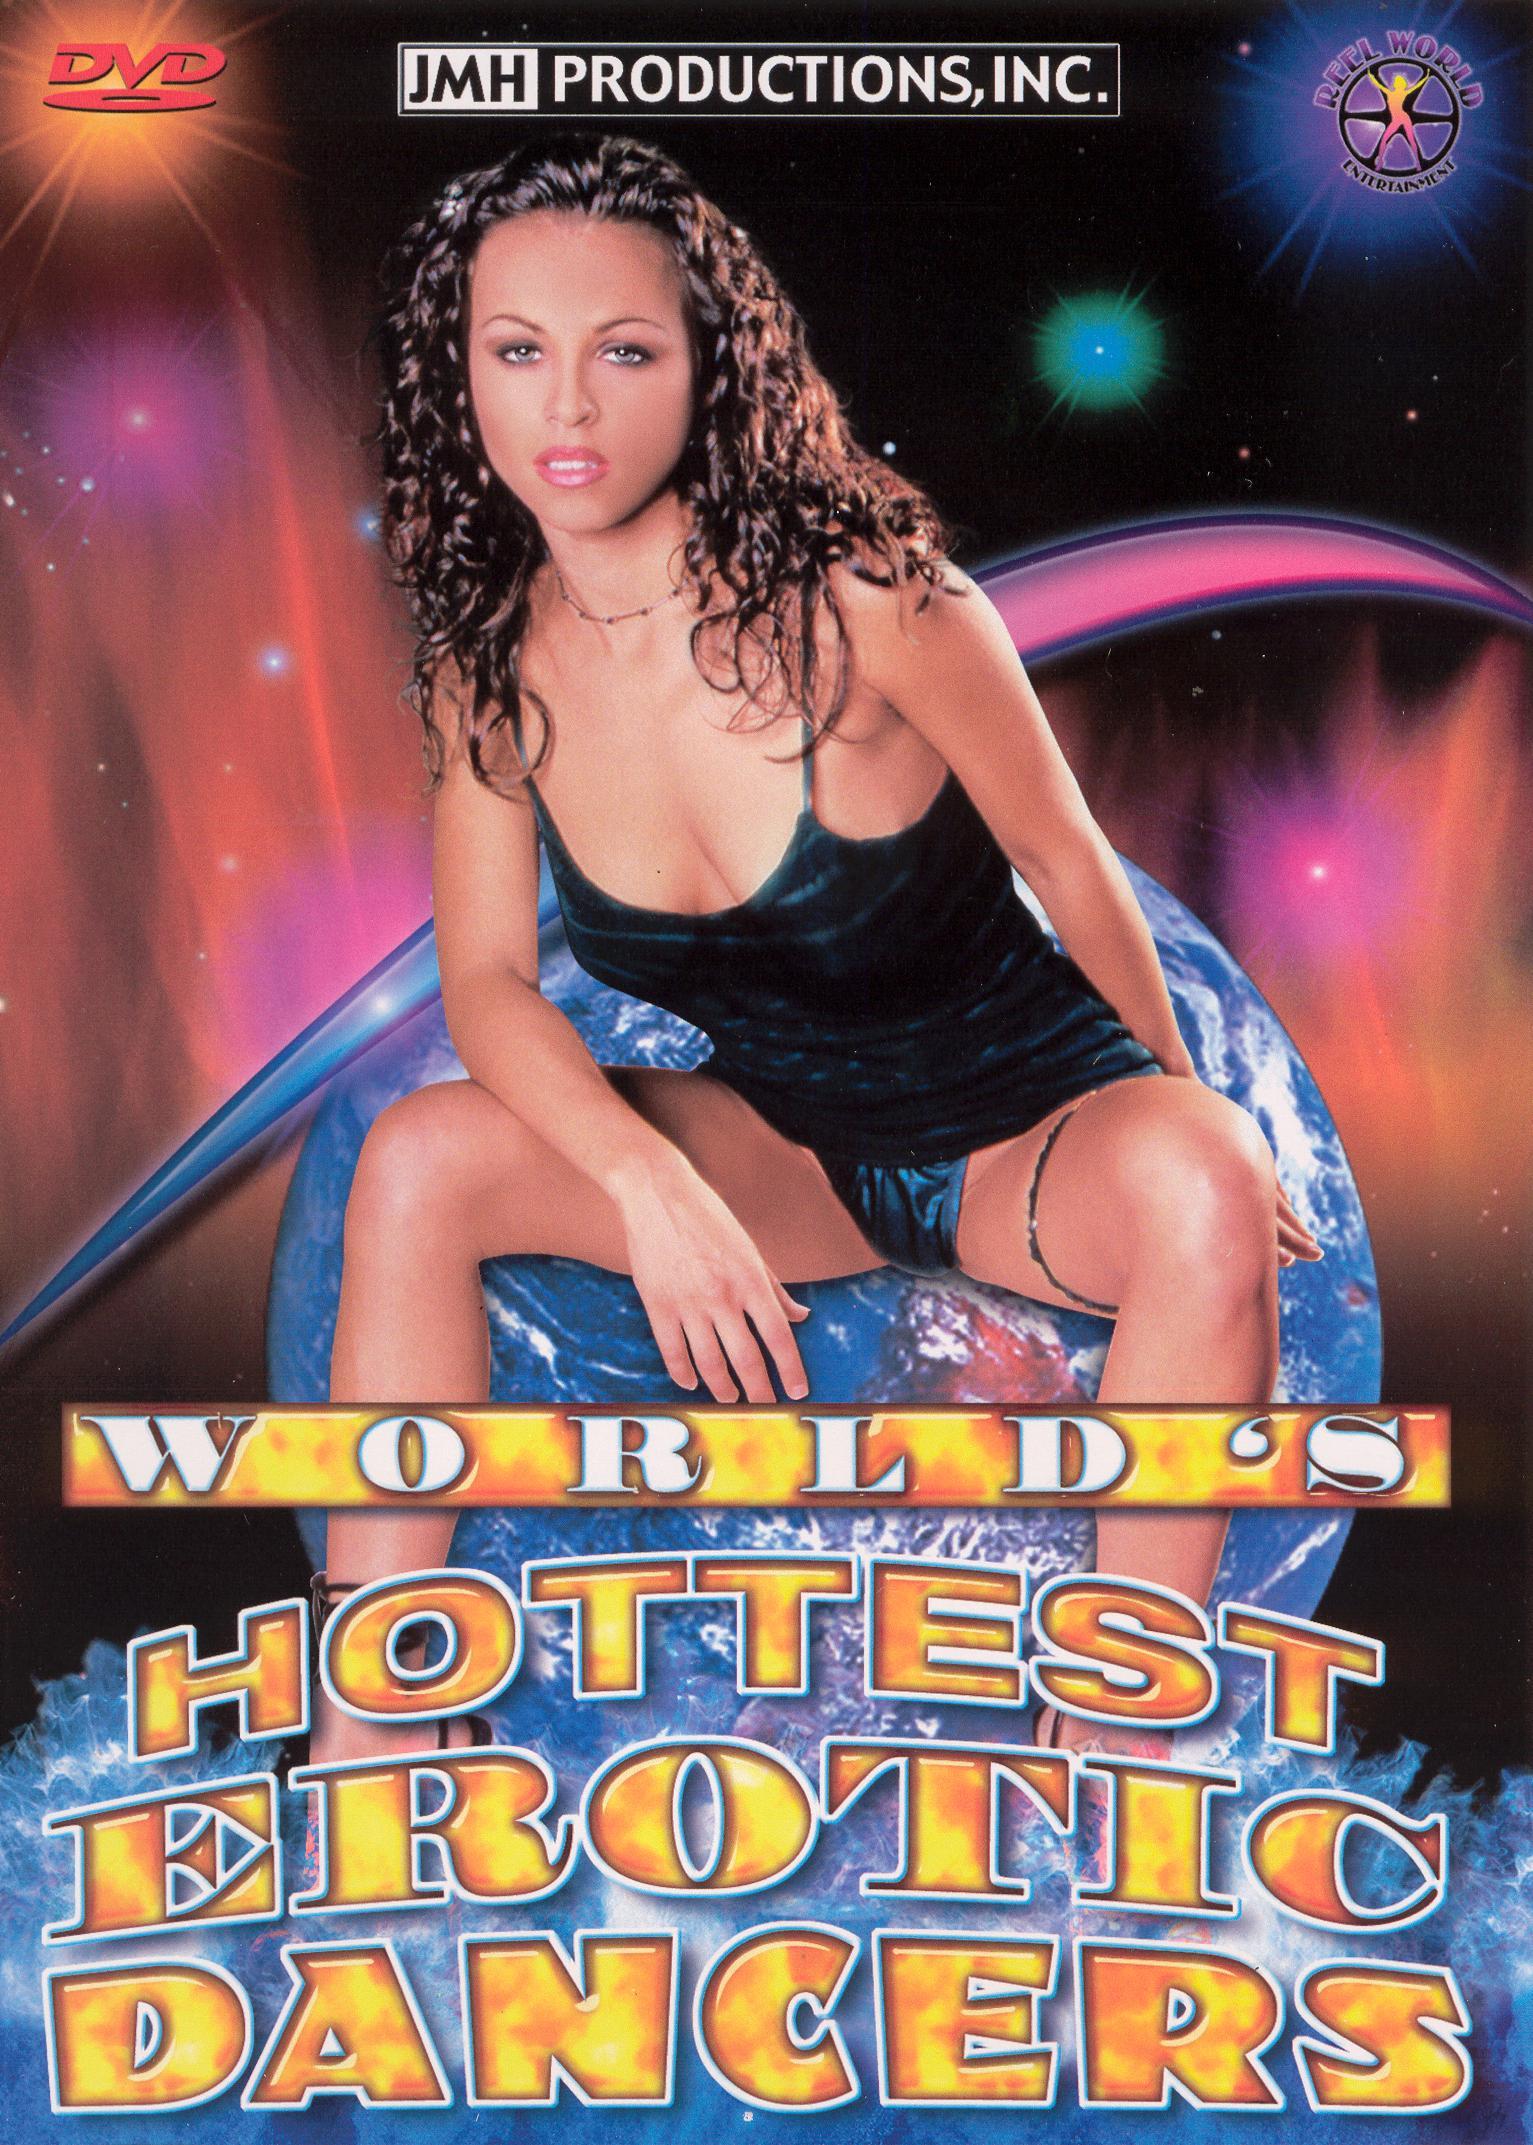 World's Hottest Erotic Dancers